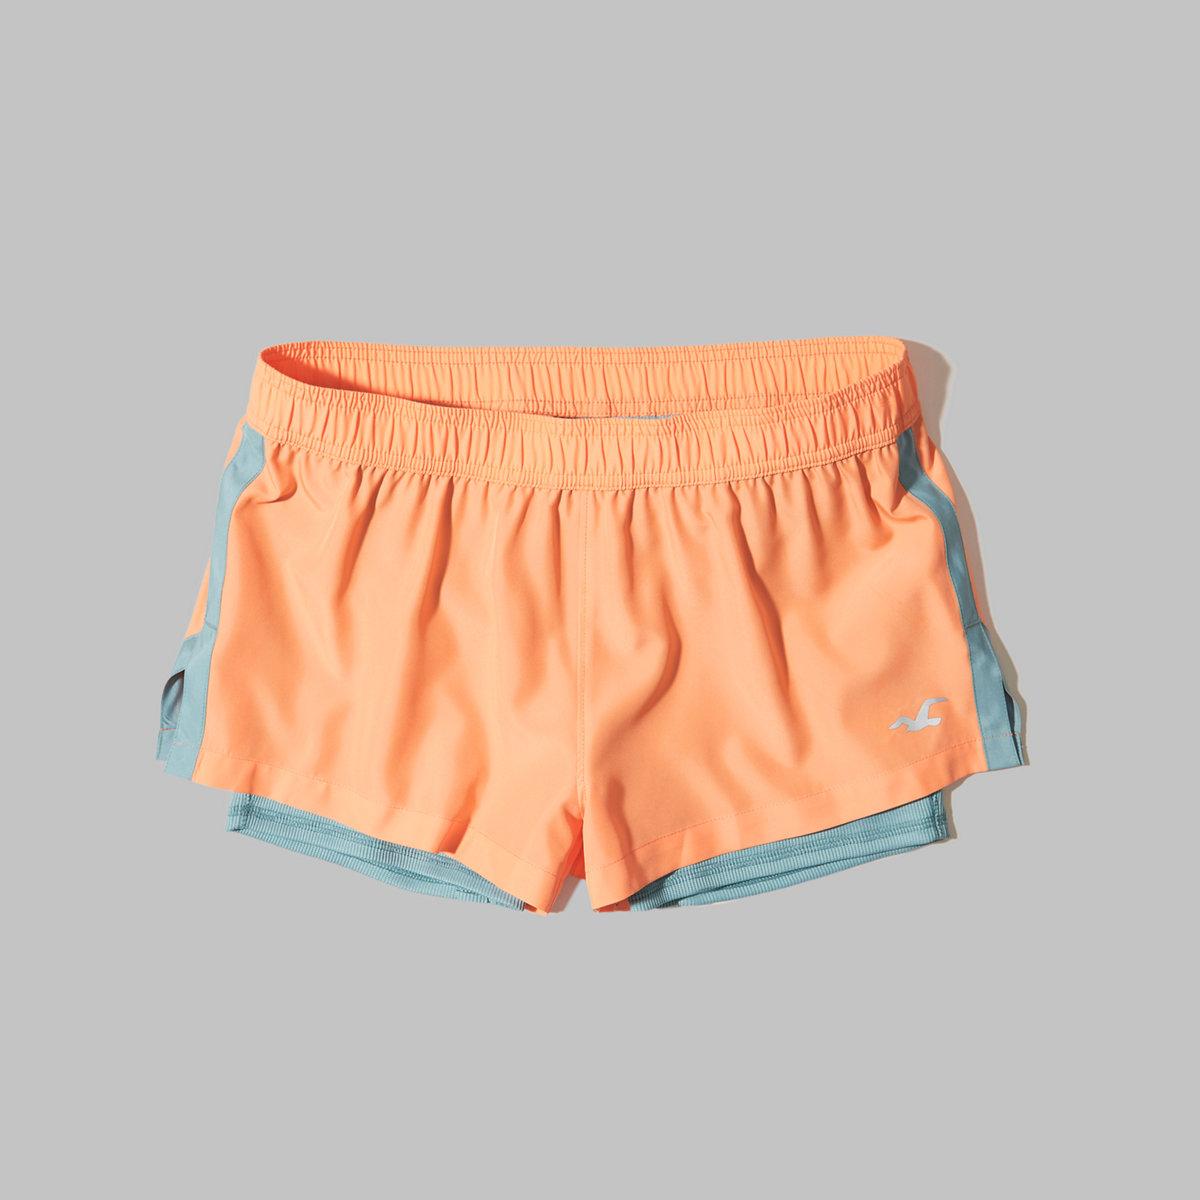 Hollister Cali Sport Nylon Running Shorts